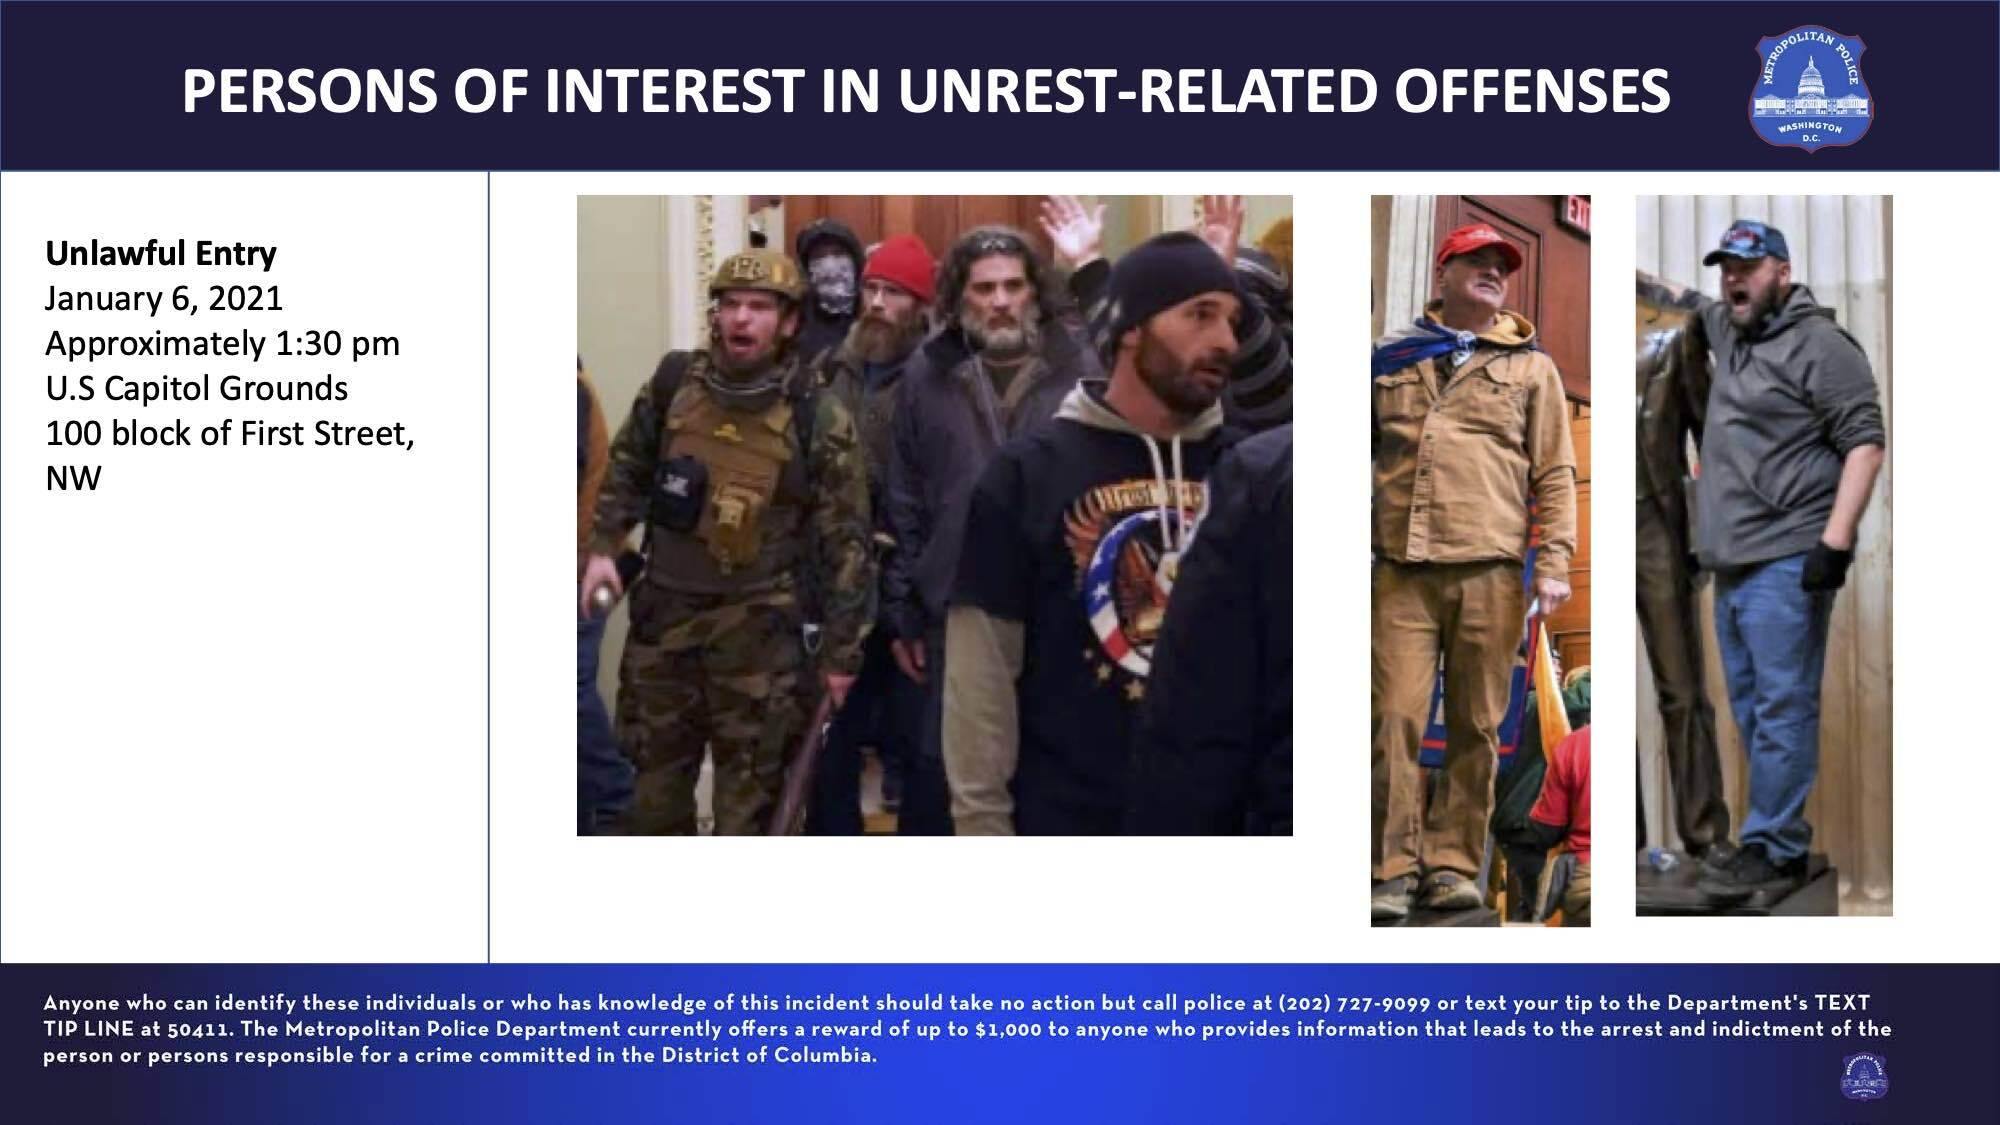 US Capitol Riots Persons of Interest 7.jpg